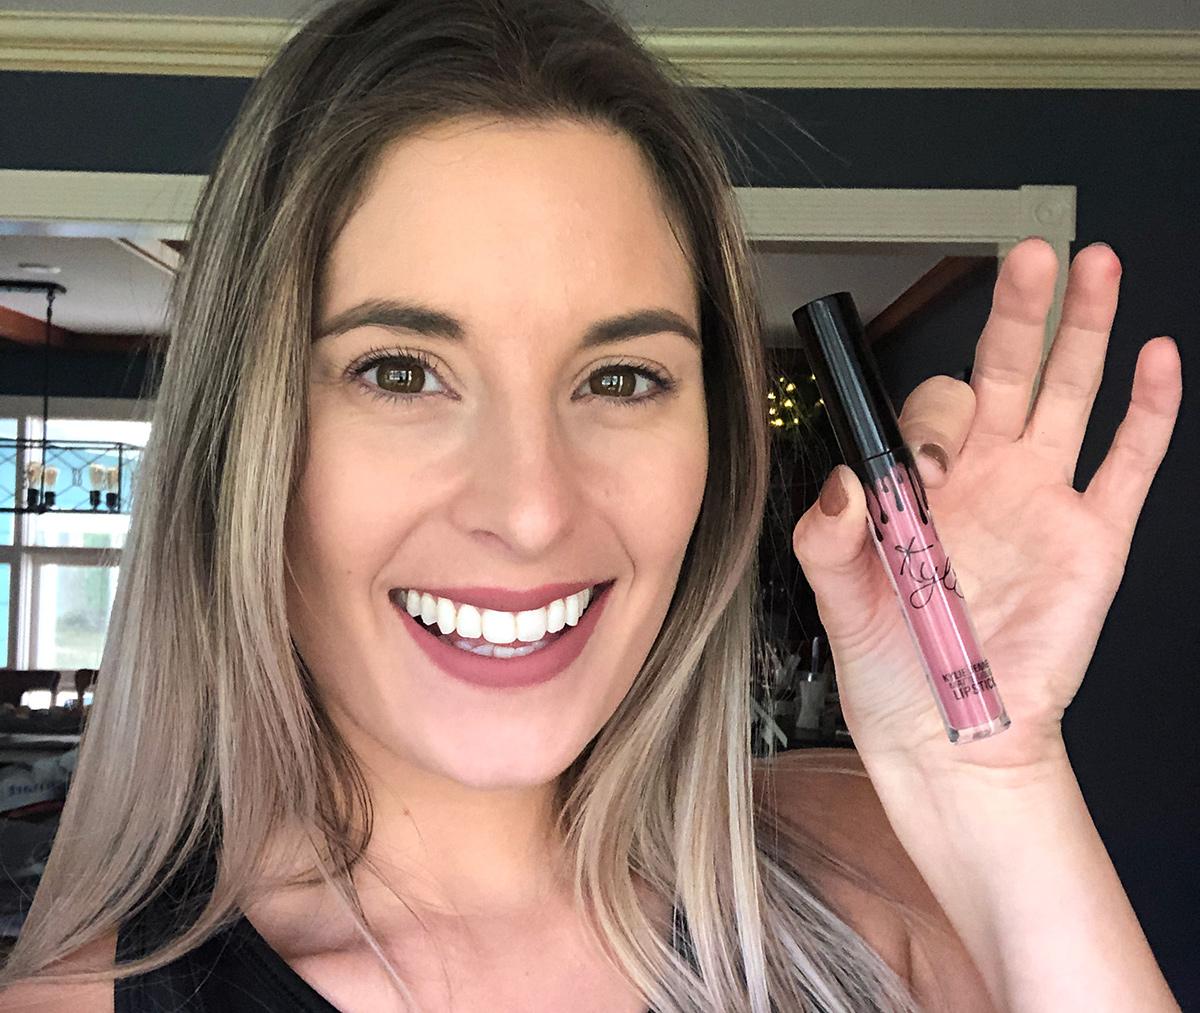 Emily with Kylie Cosmetics lip stick